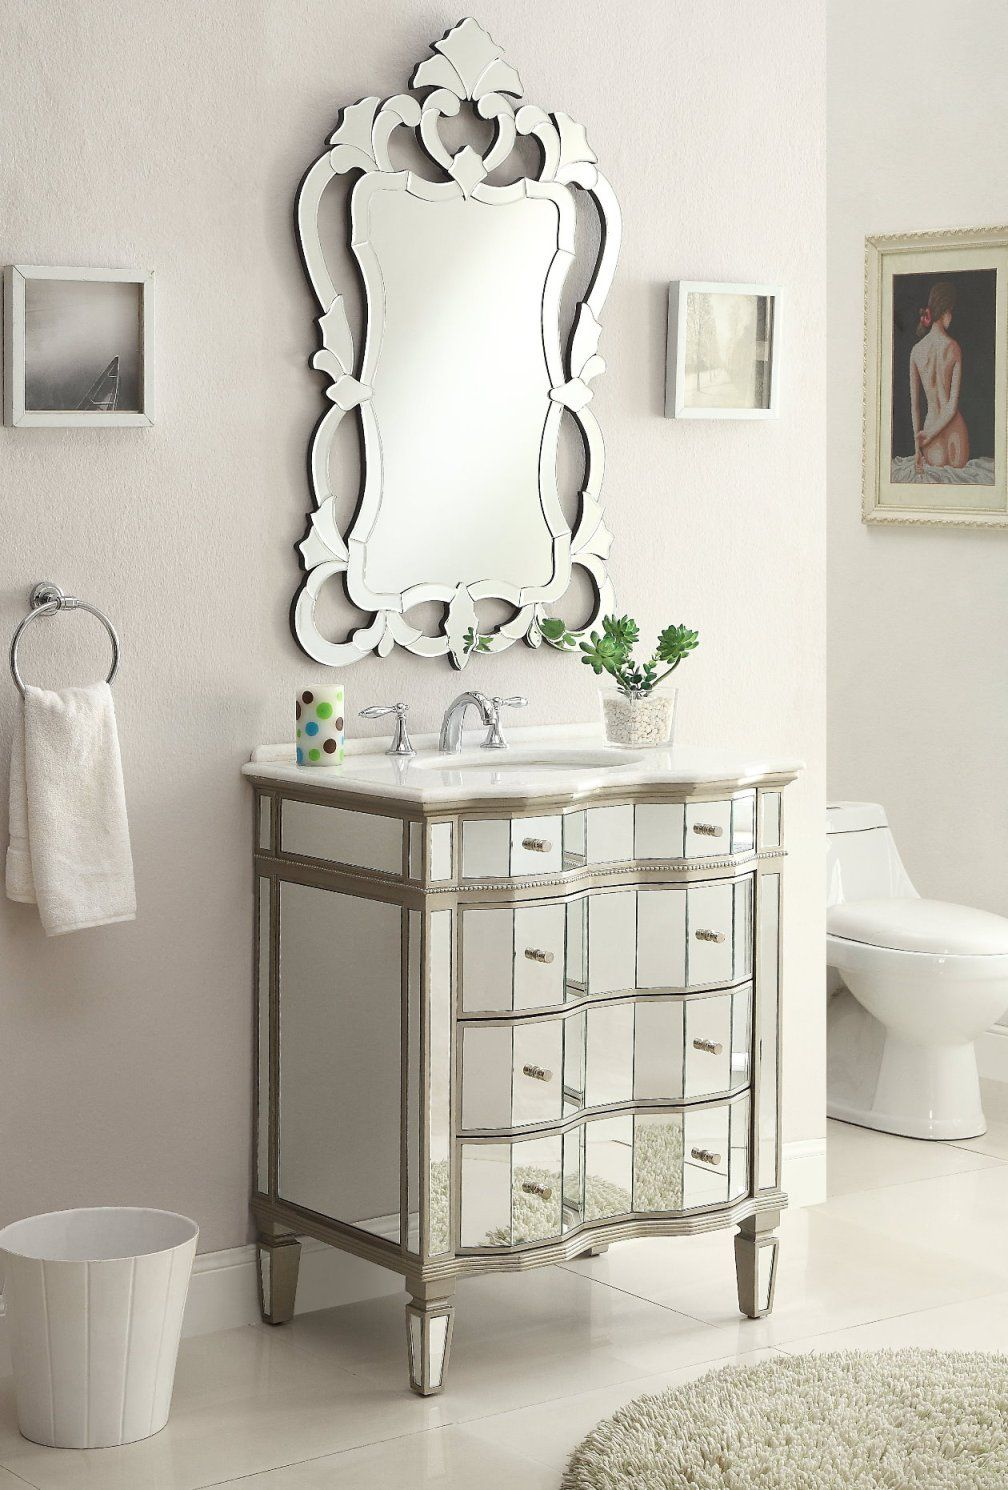 30 Inch Adelina Mirrored Bath Vanity Cabinet Mirror Bathroom Sink Vanity Vanity Sink Vanity